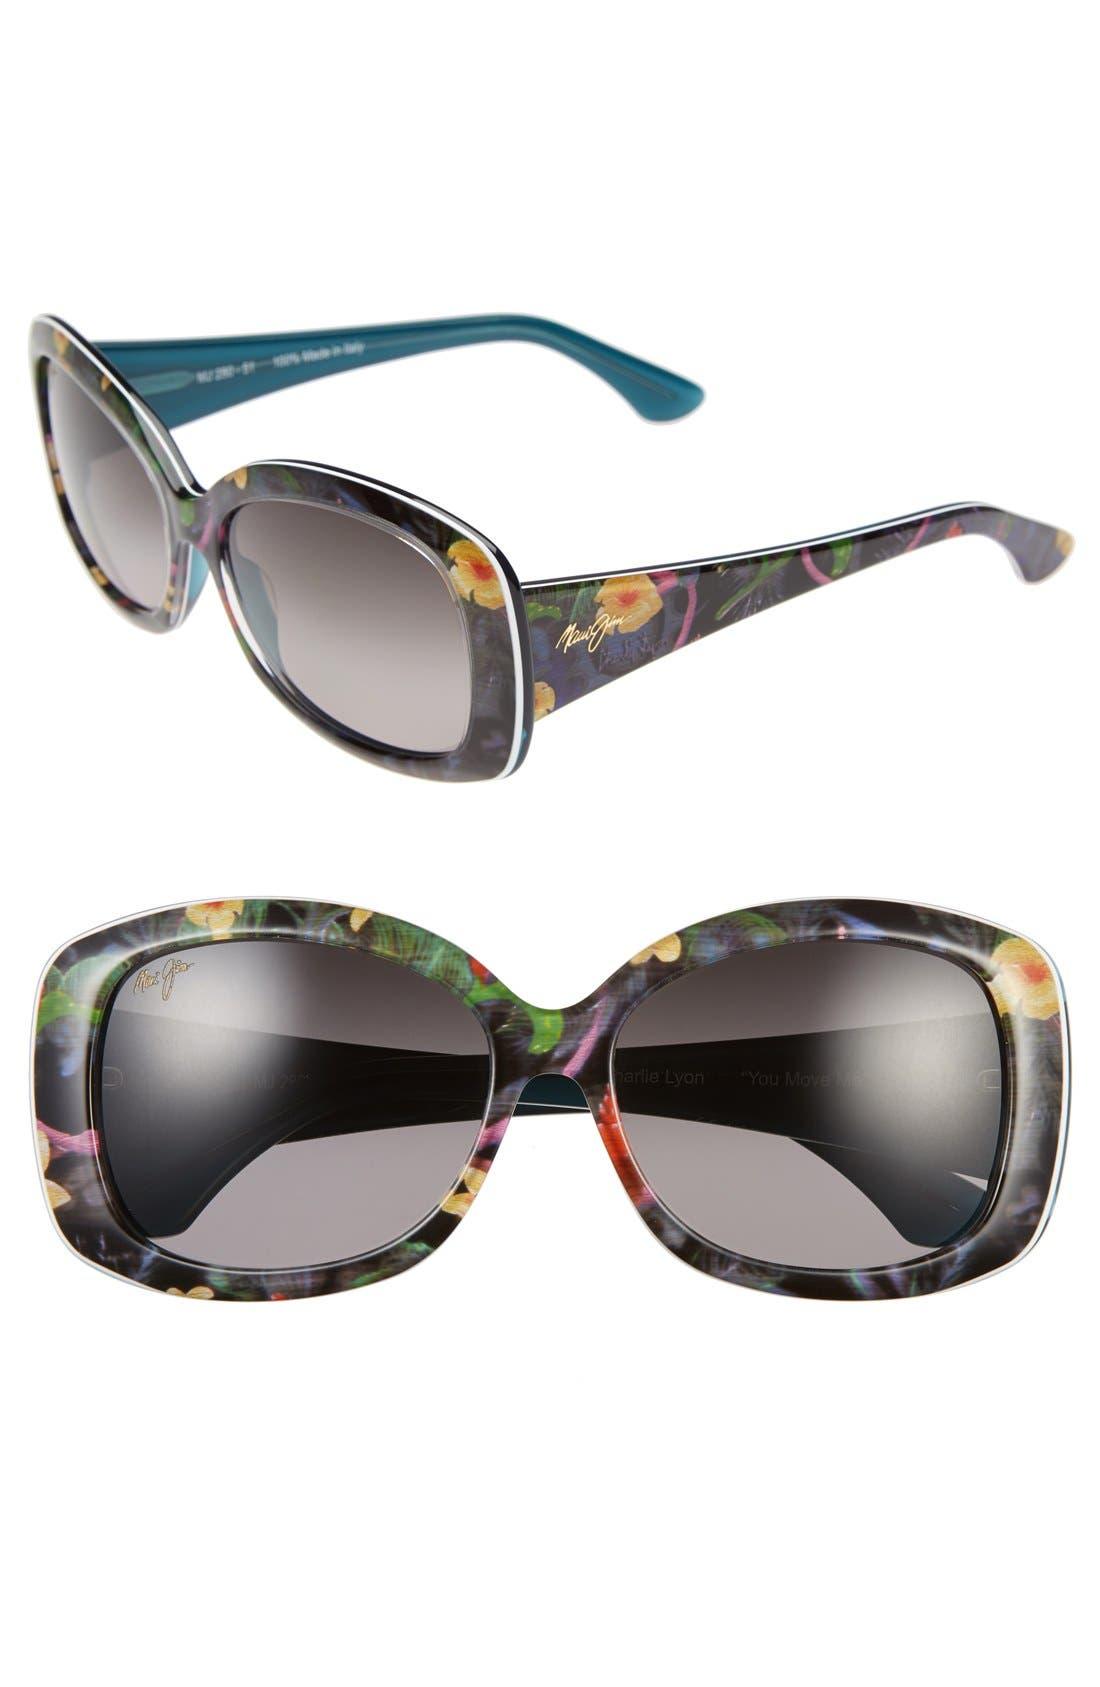 Maui Jim You Move Me 60mm PolarizedPlus2® Sunglasses